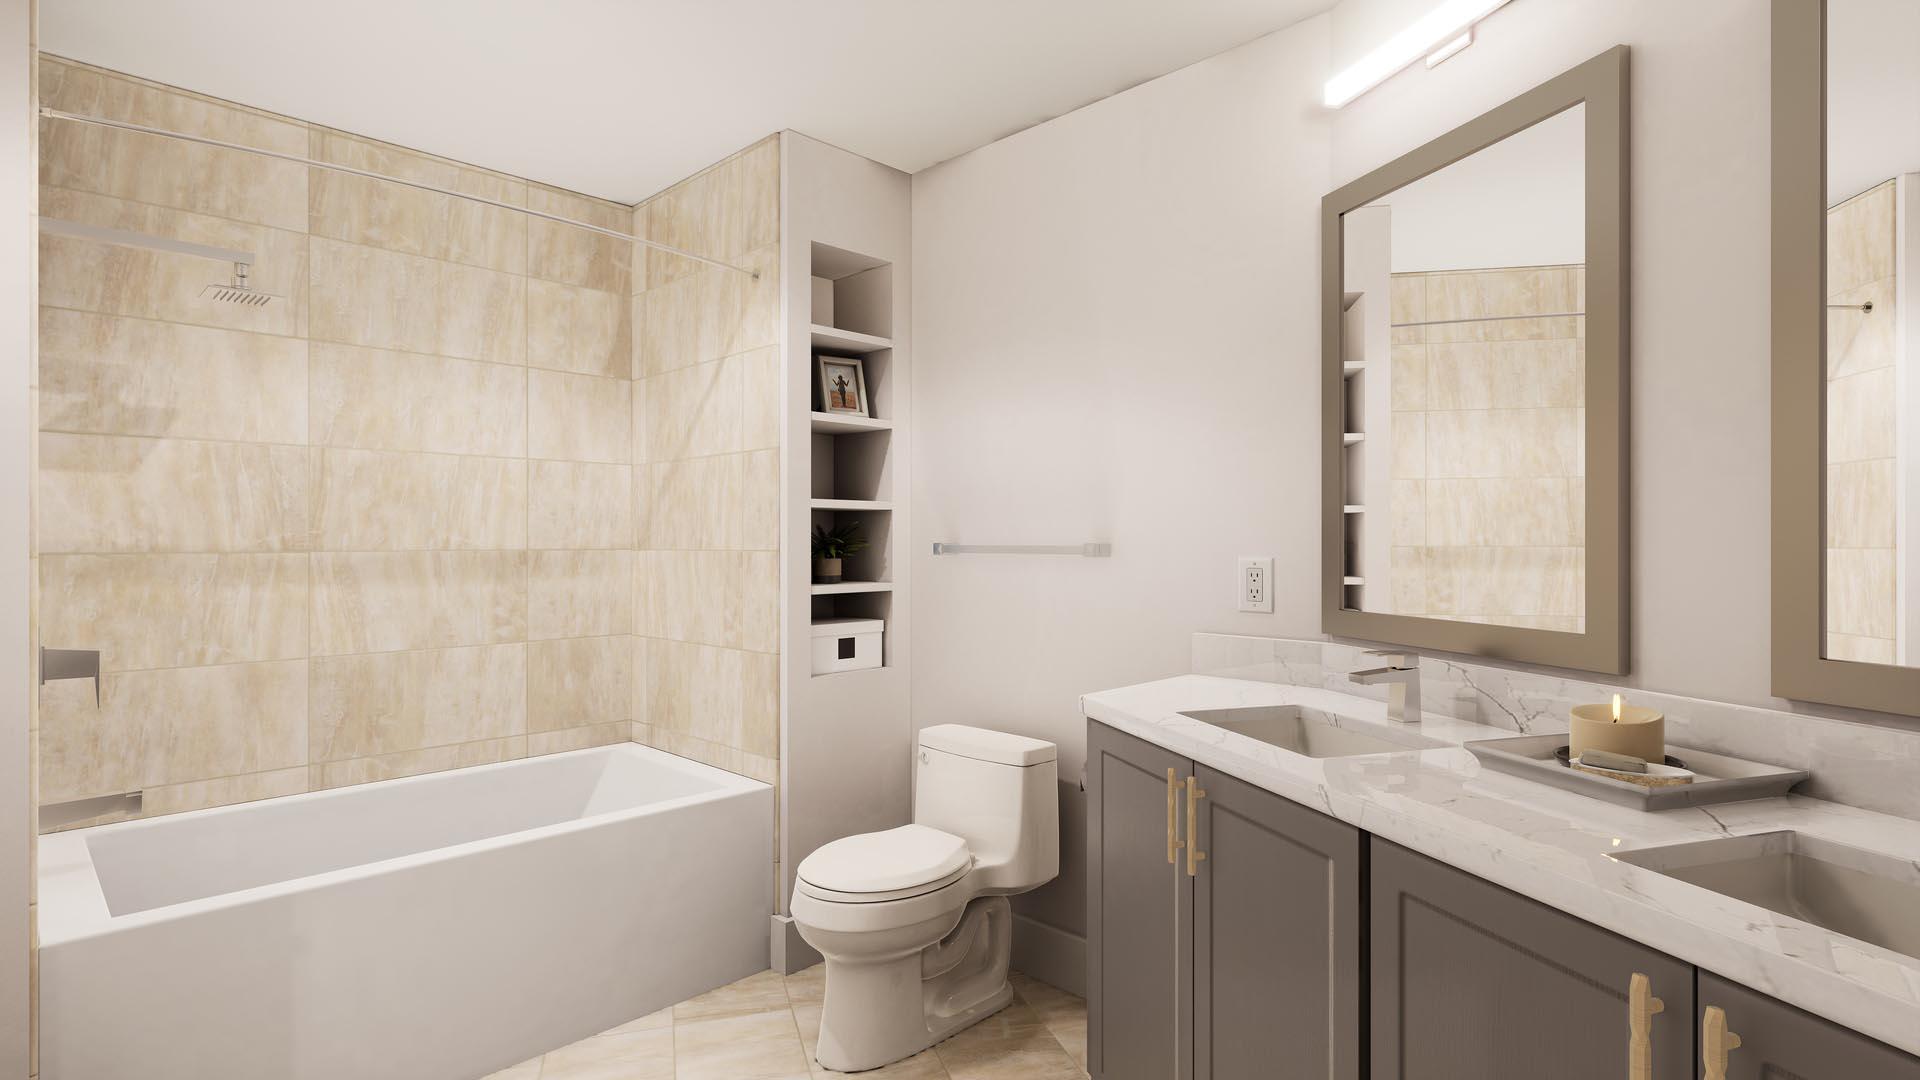 An apartment bathroom with finish option 3